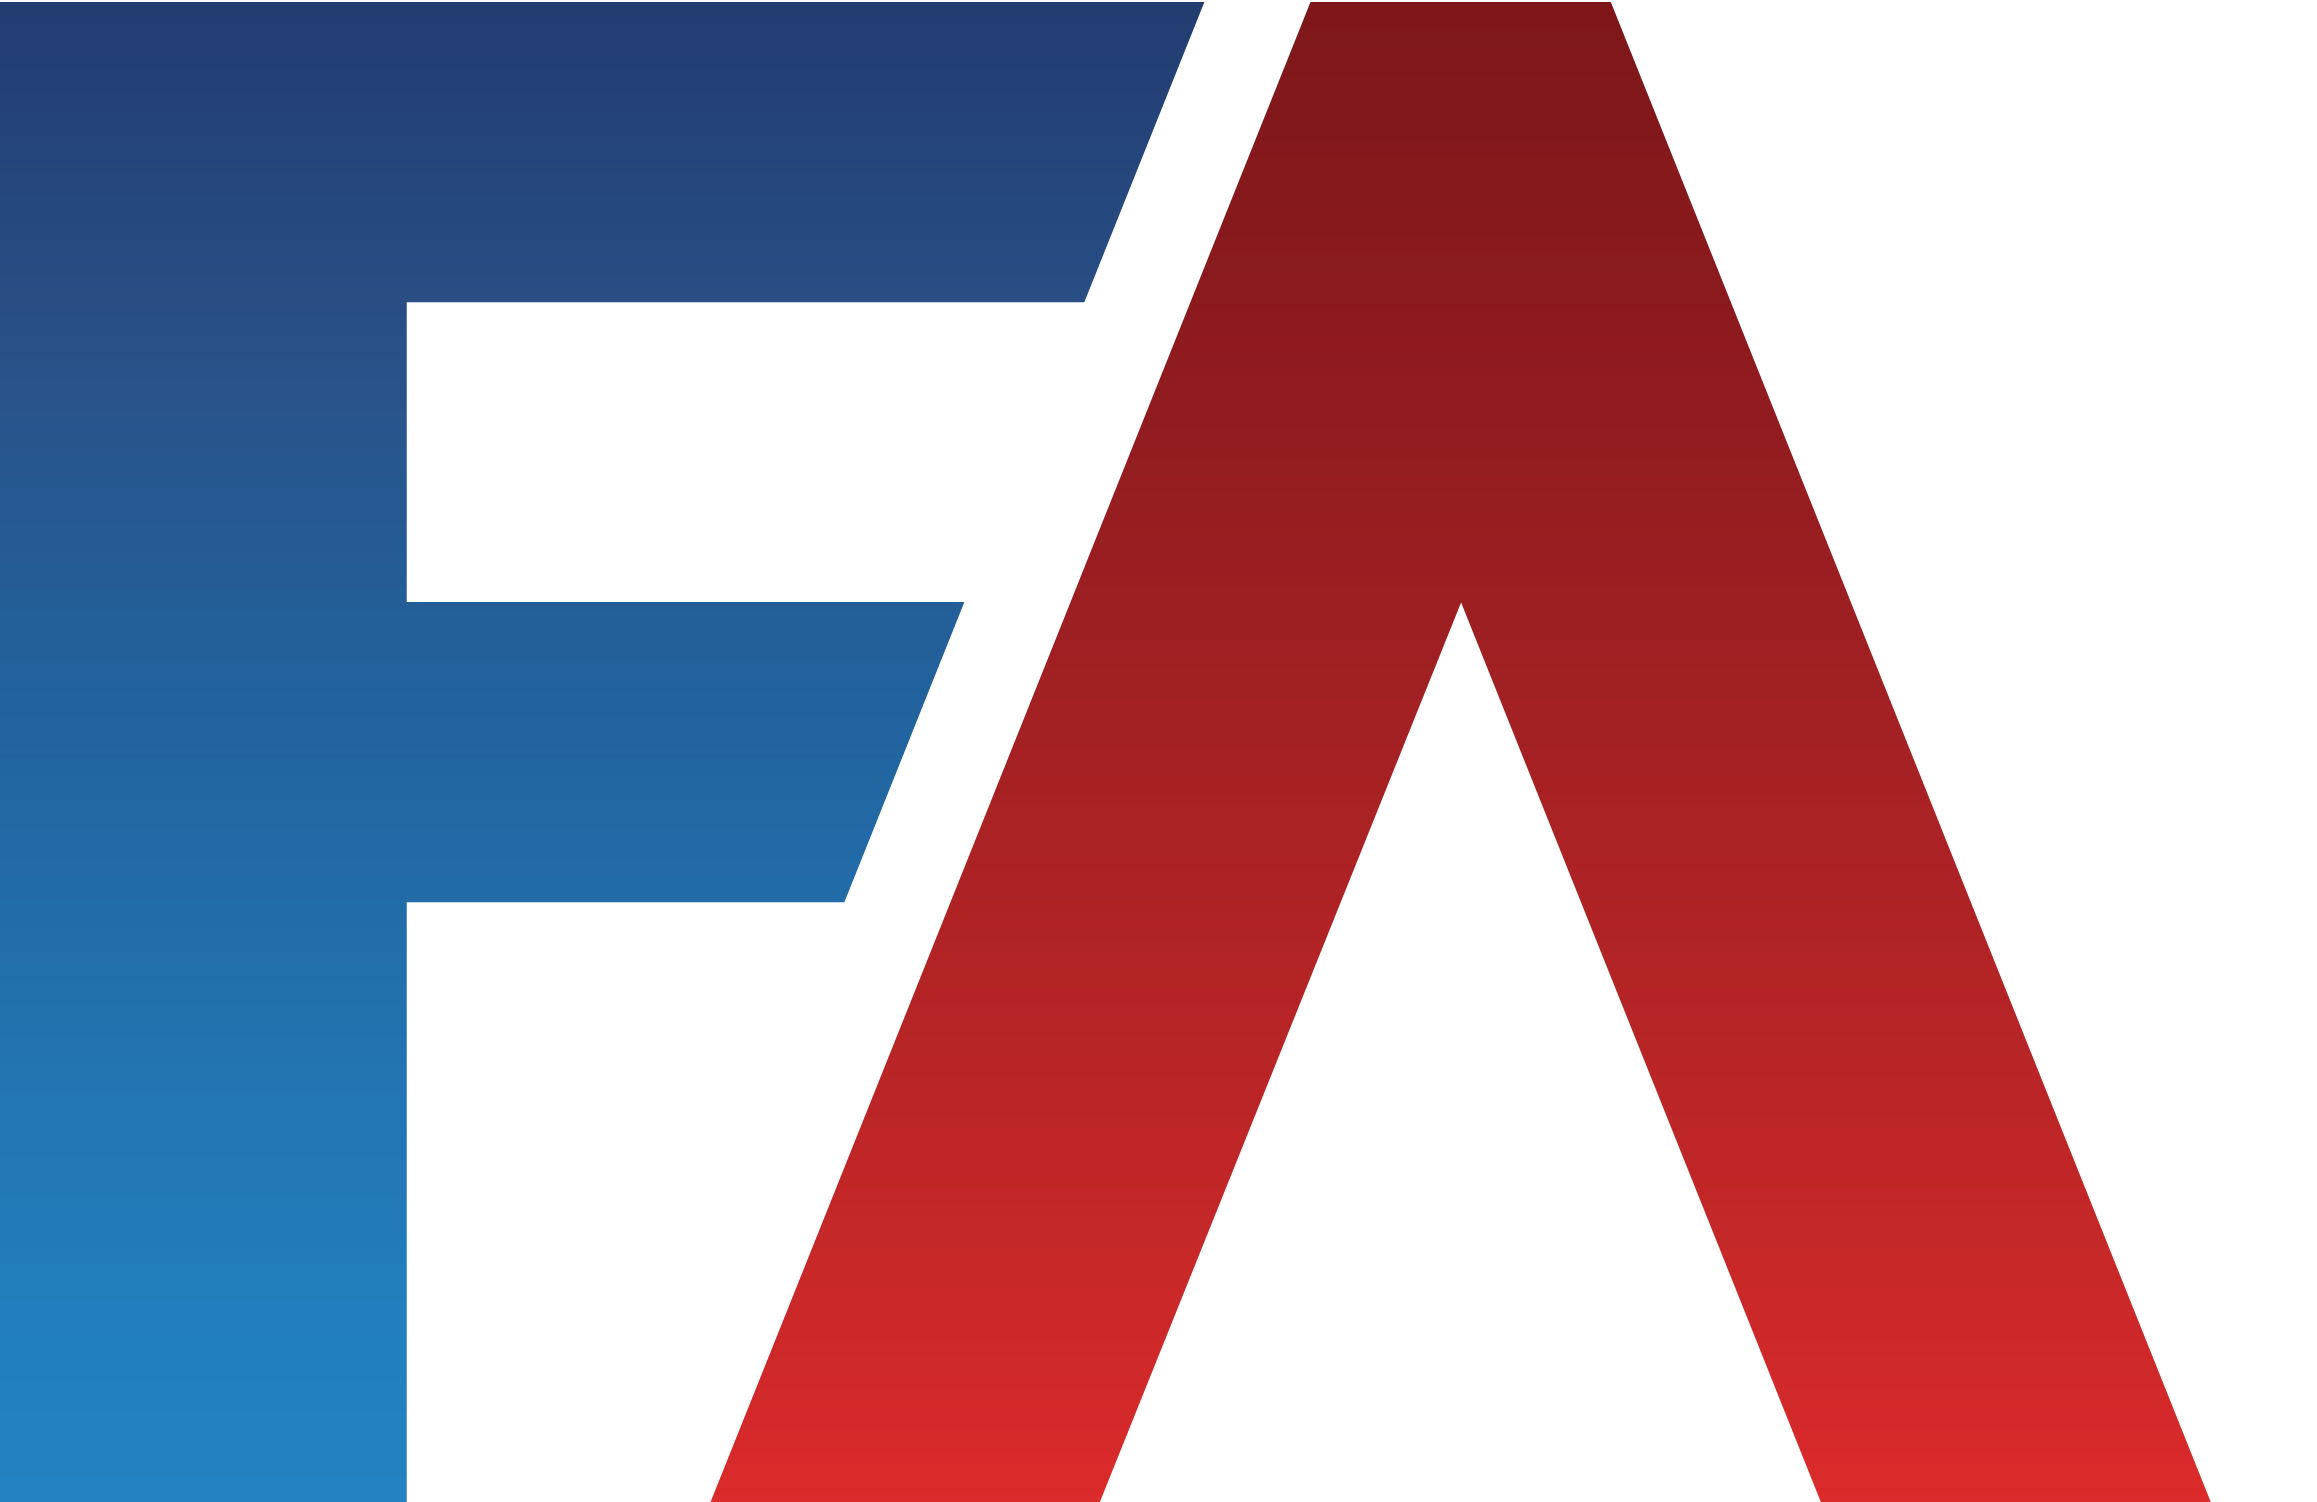 Mike Zunino - C | FantasyAlarm.com